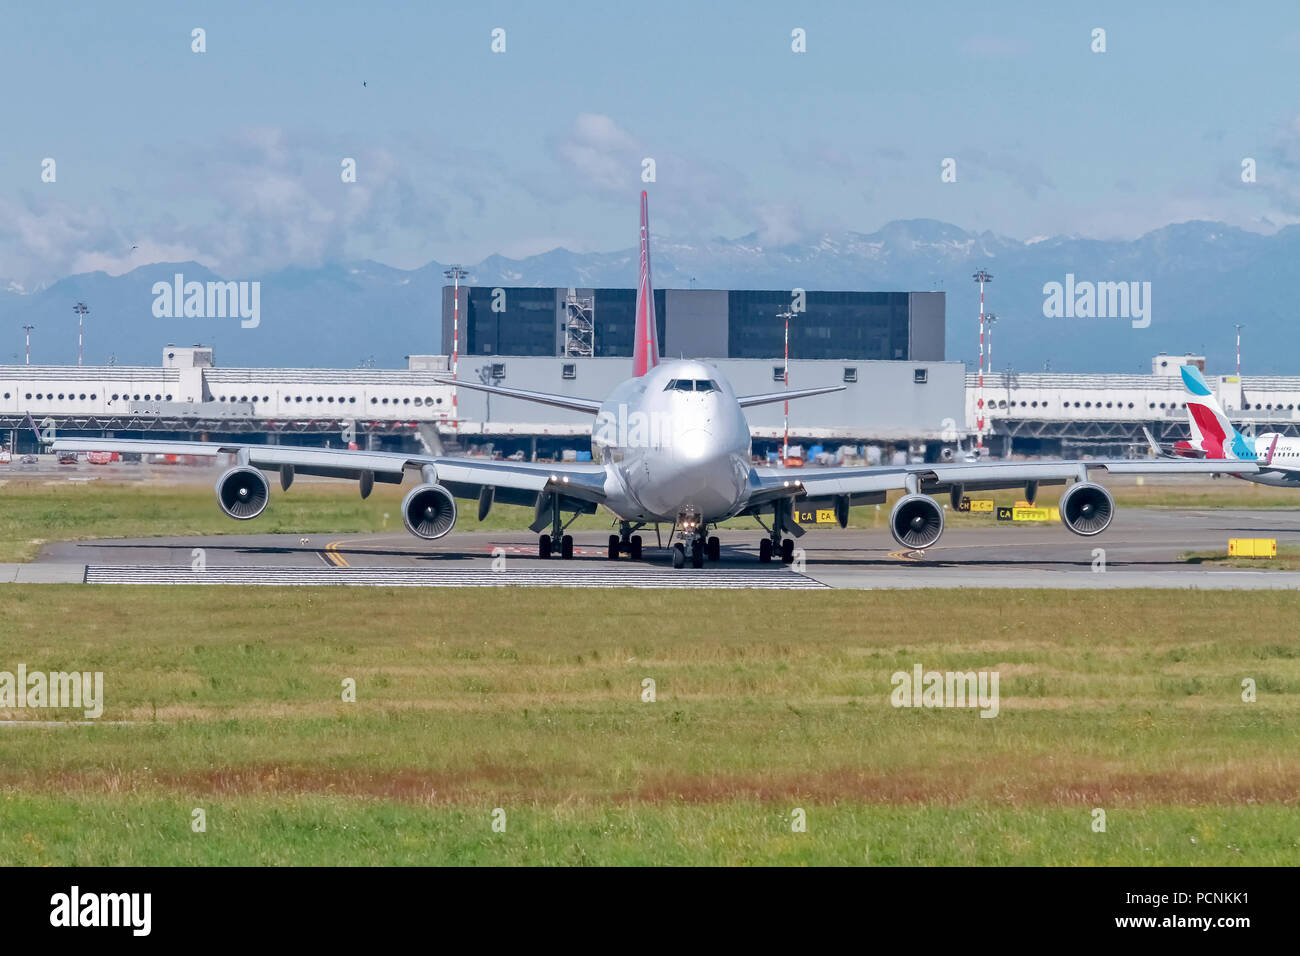 ACG Air Cargo Global Boeing 747-400(F) (OM-ACB) - Stock Image